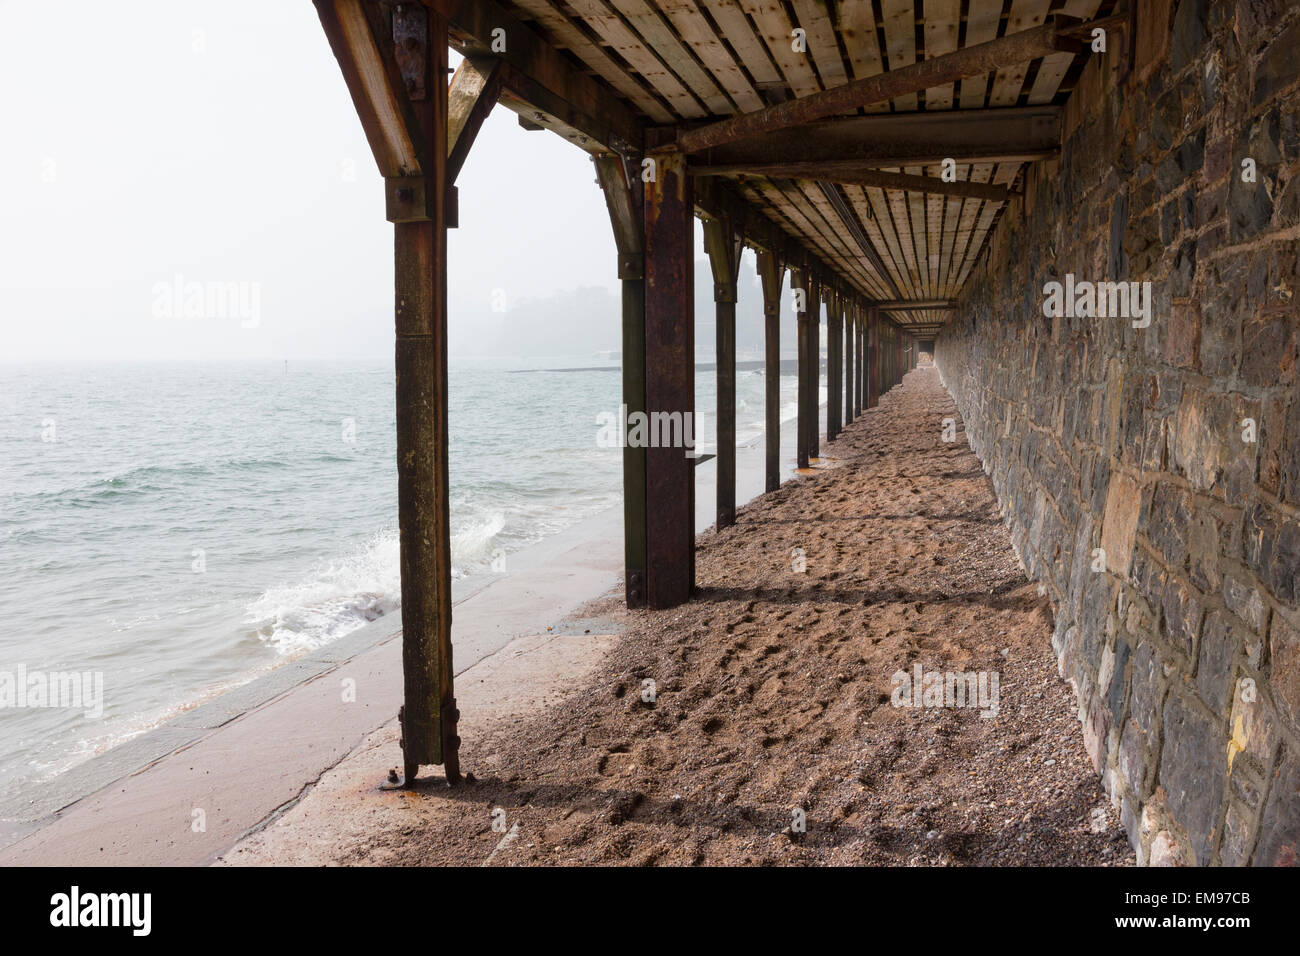 Dawlish Station, South Devon, covered promenade under platform Stock Photo